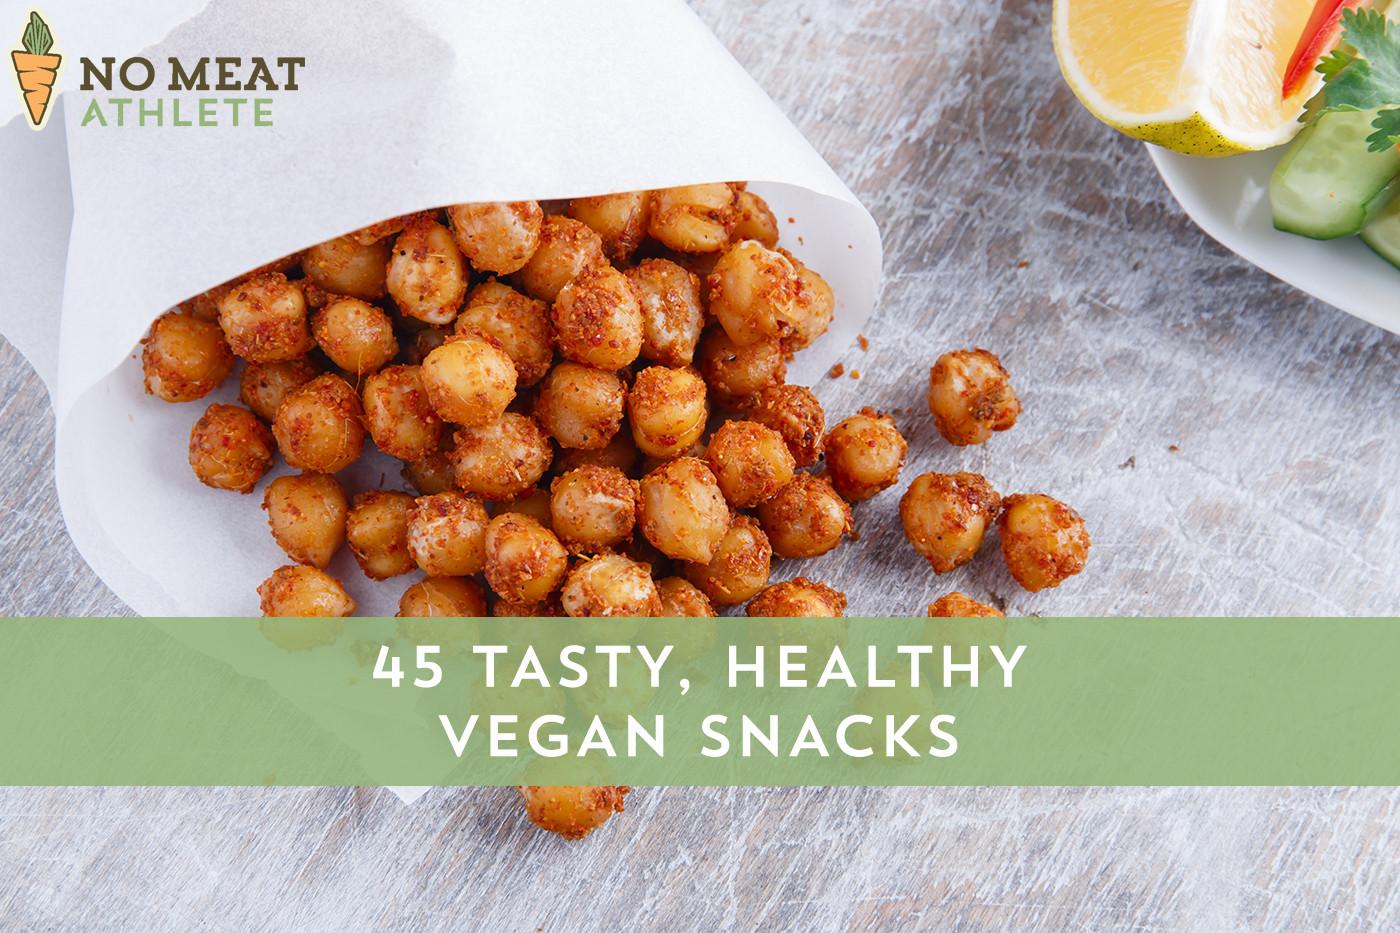 Healthy Vegan Snacks  Vegan Snacks that are Healthy & Tasty